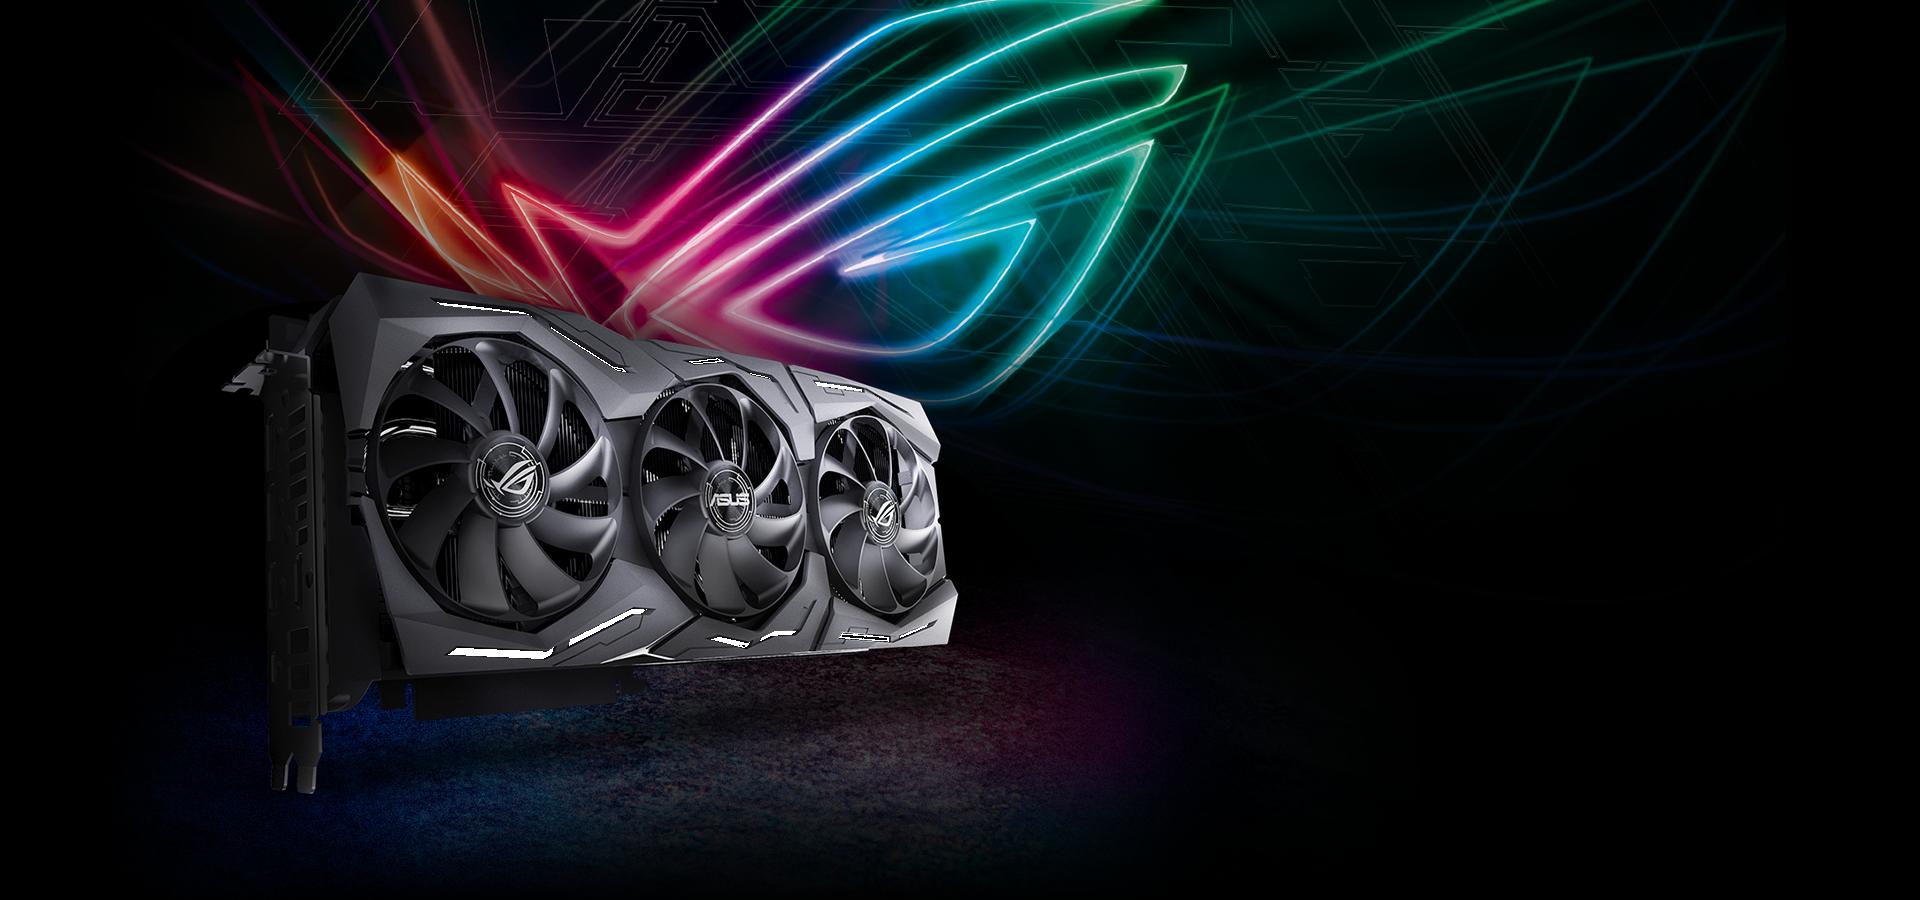 card đồ họaASUS GeForce RTX 2070 Super 8GB GDDR6 ROG Strix